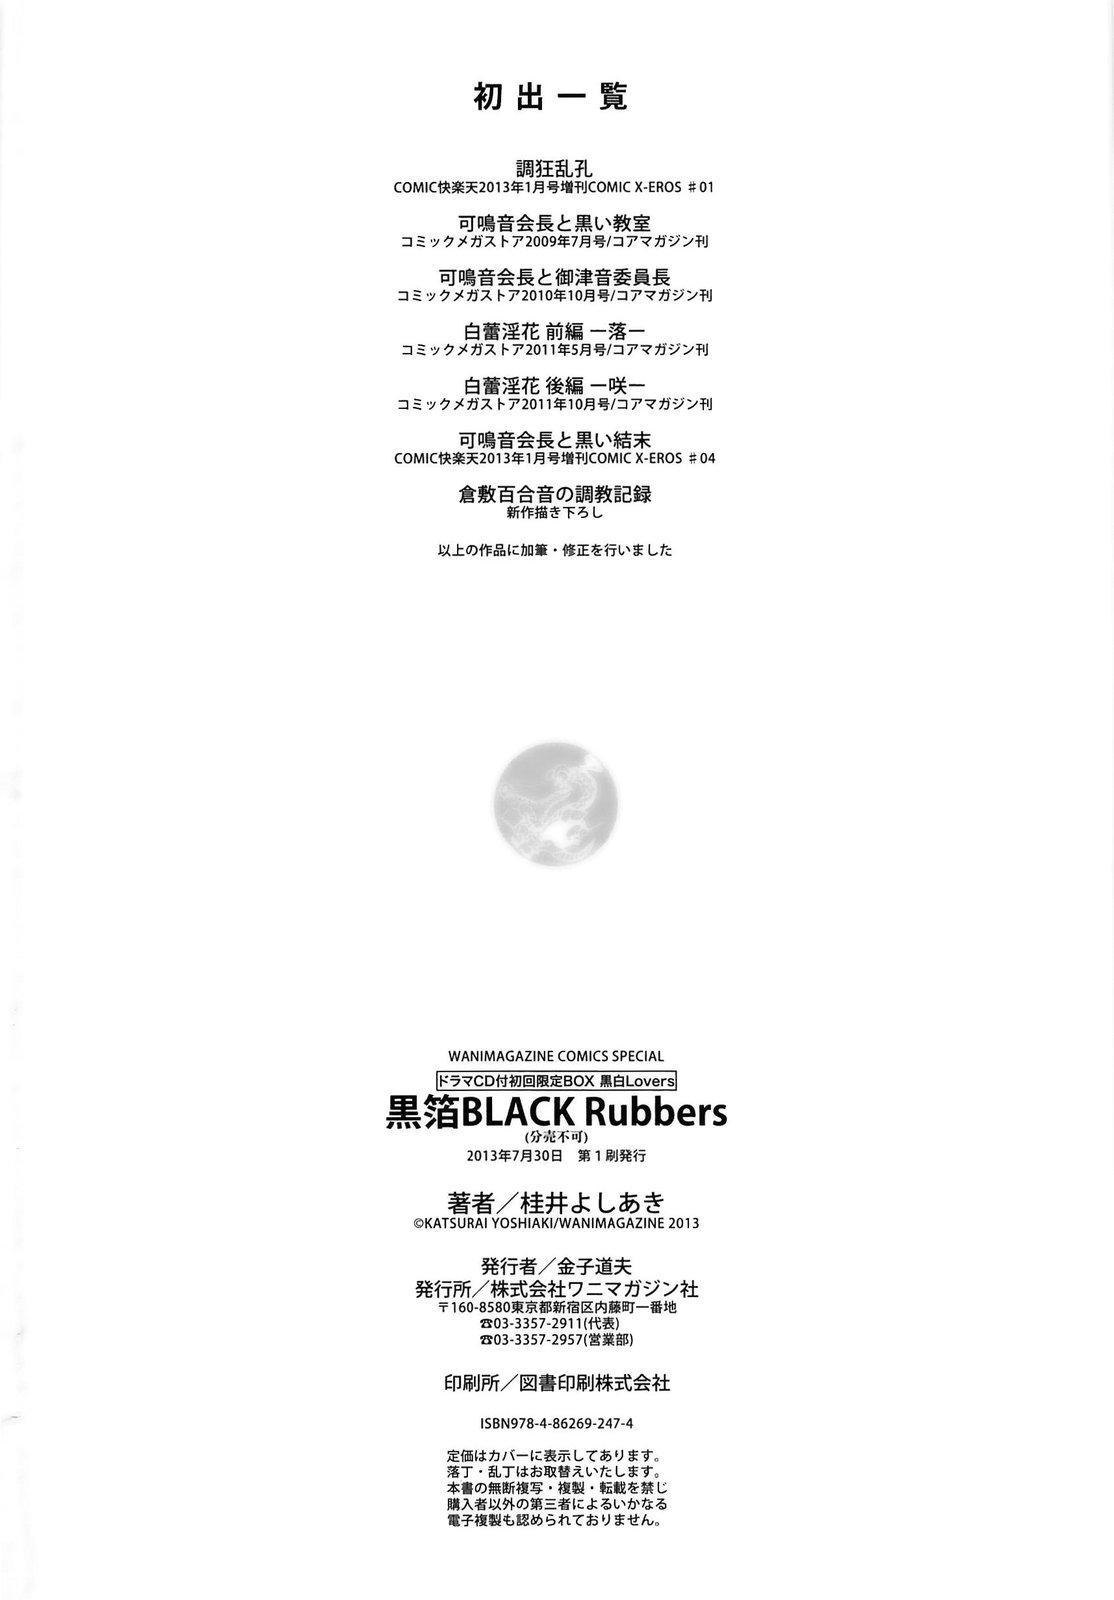 Black Rubbers 214